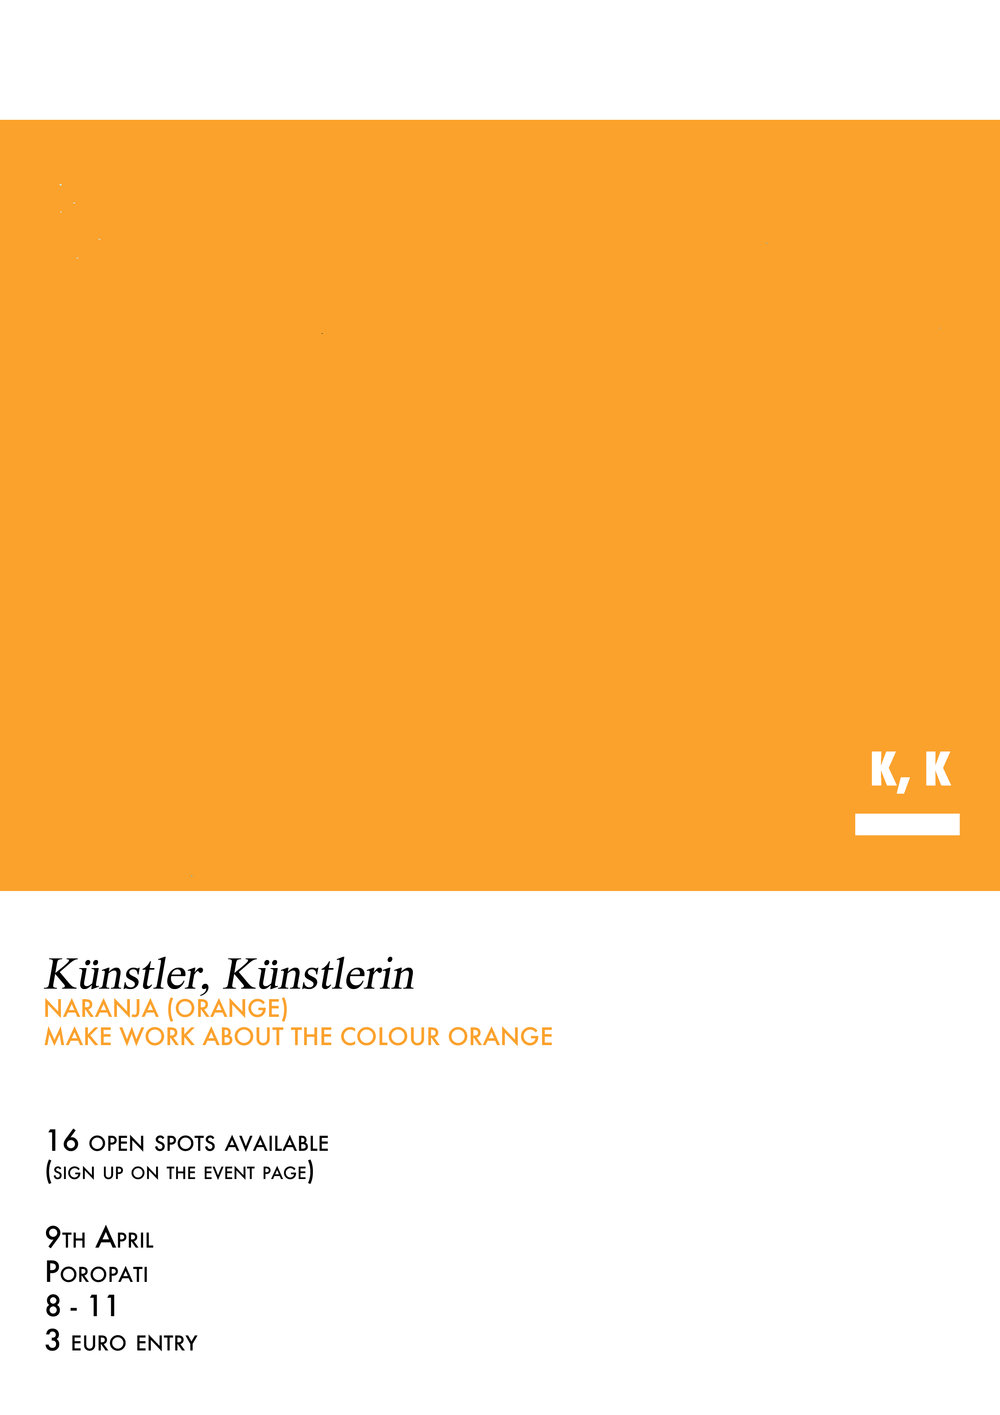 Künstler, Künstlerin, Naranja (Orange) make work about the colour Orange.jpg